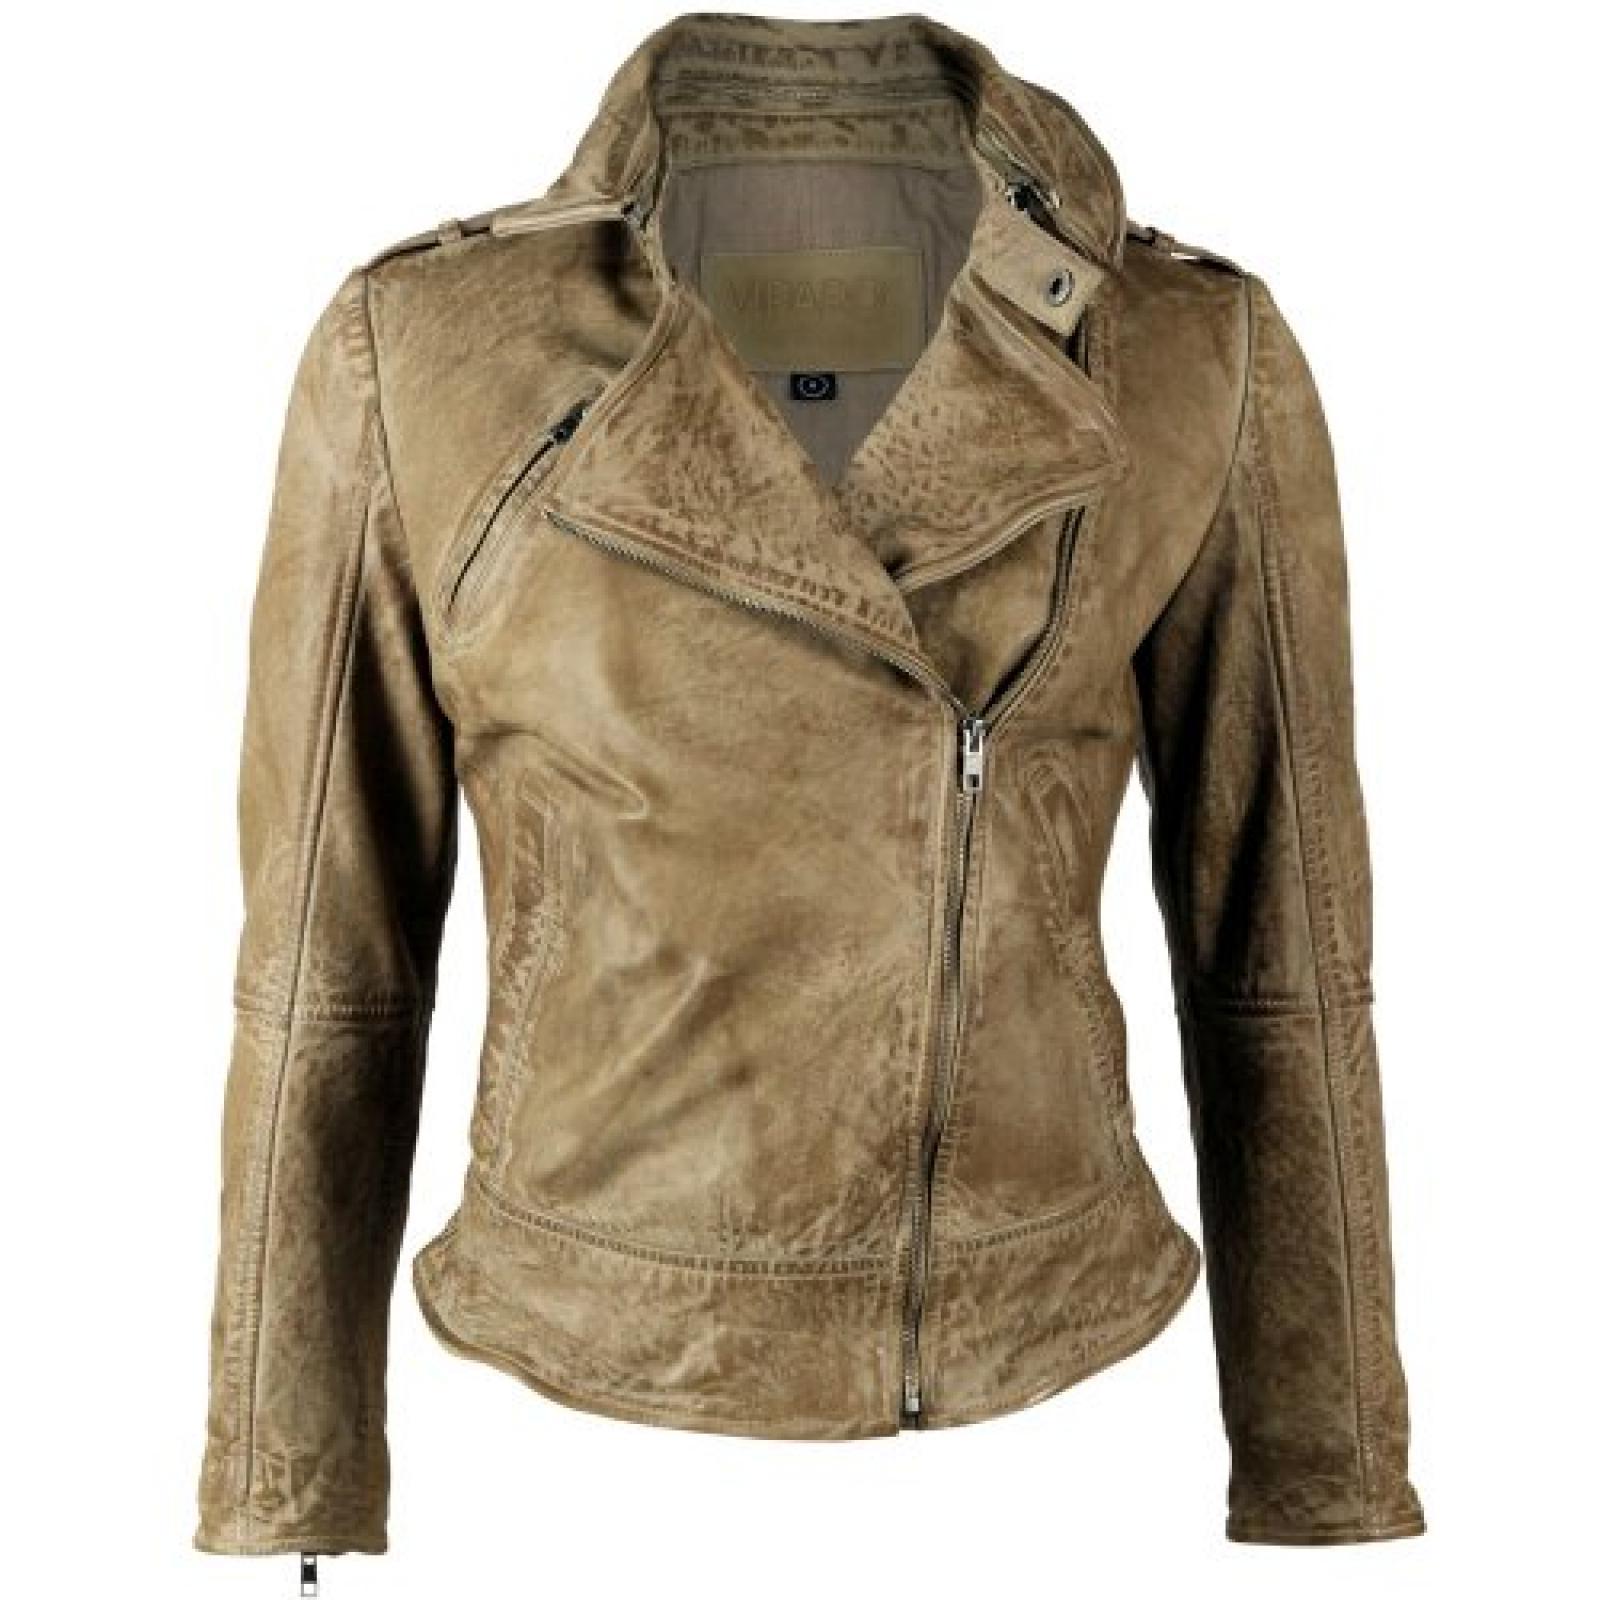 VIPARO Latte Stonewash Asymmetrical Biker Lambskin Leather Jacket - Kendall